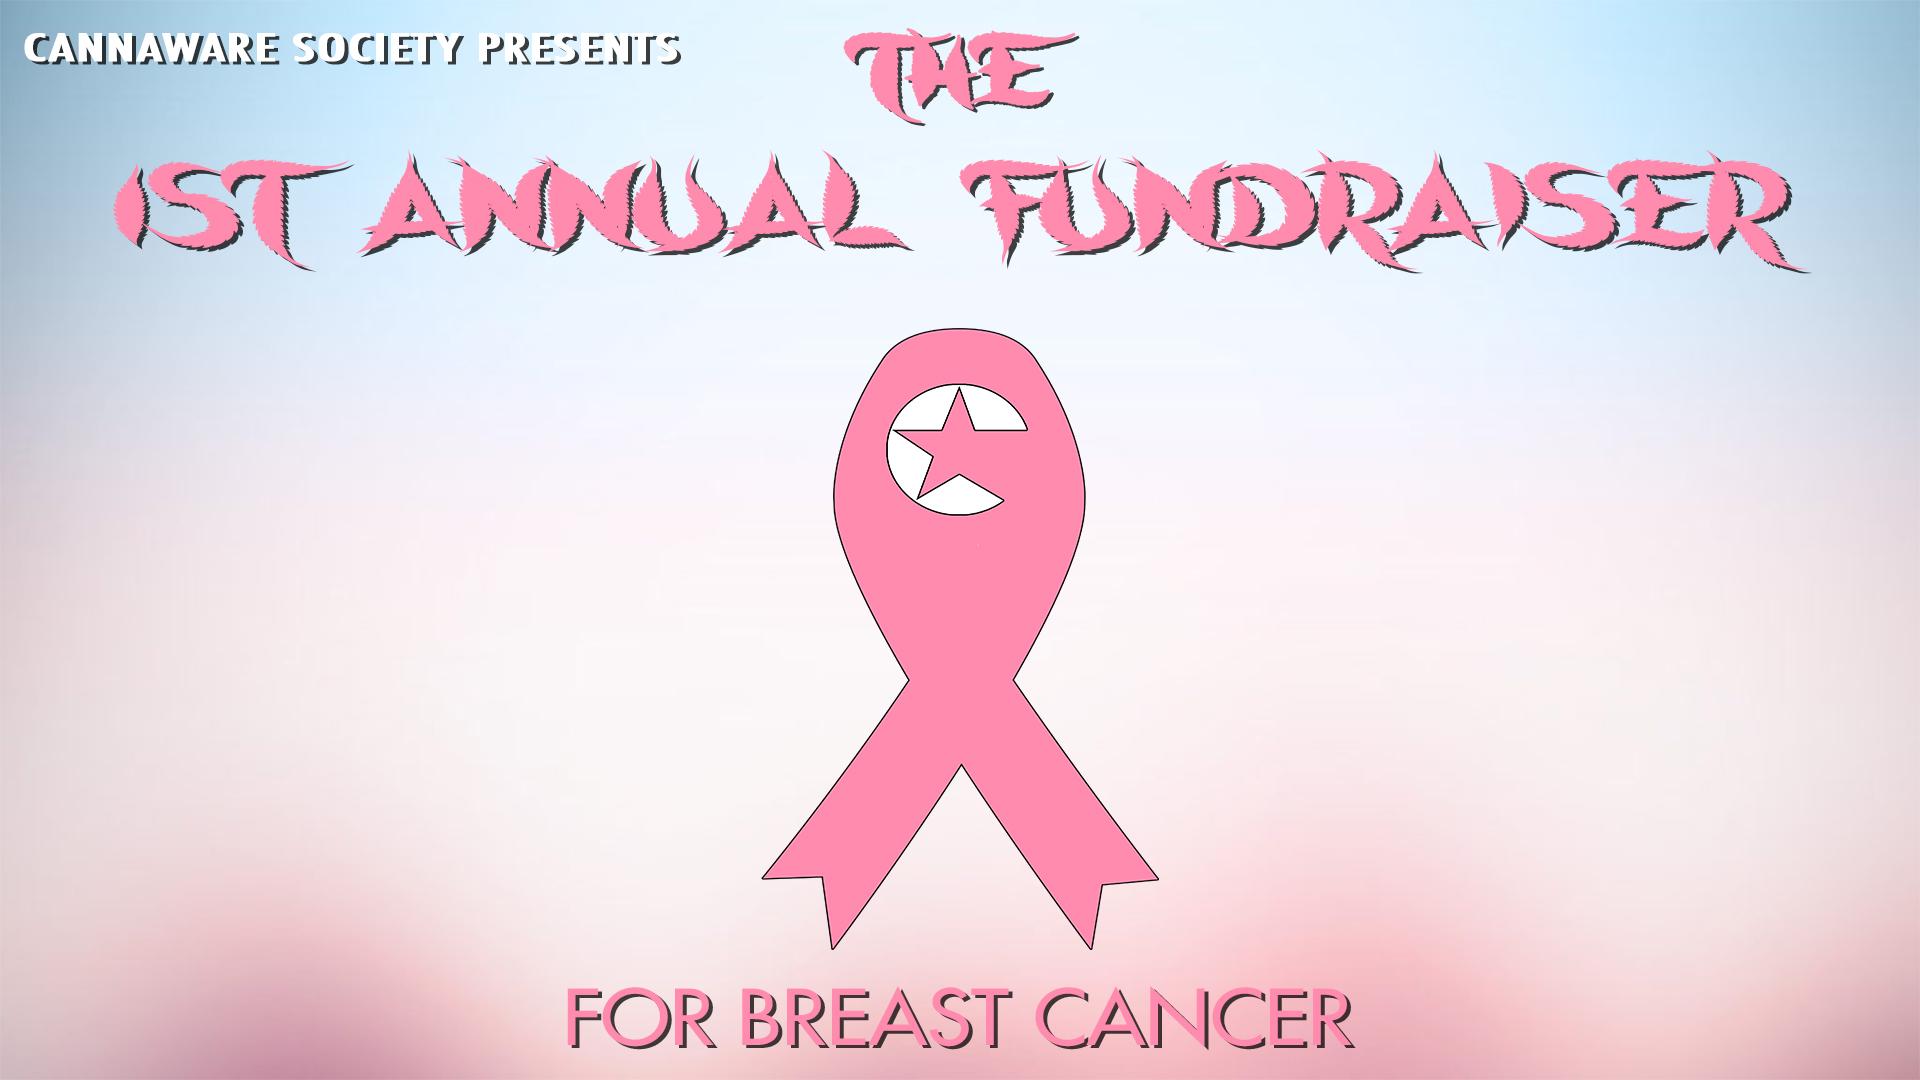 1st Annual Cannaware Fundraiser recap video